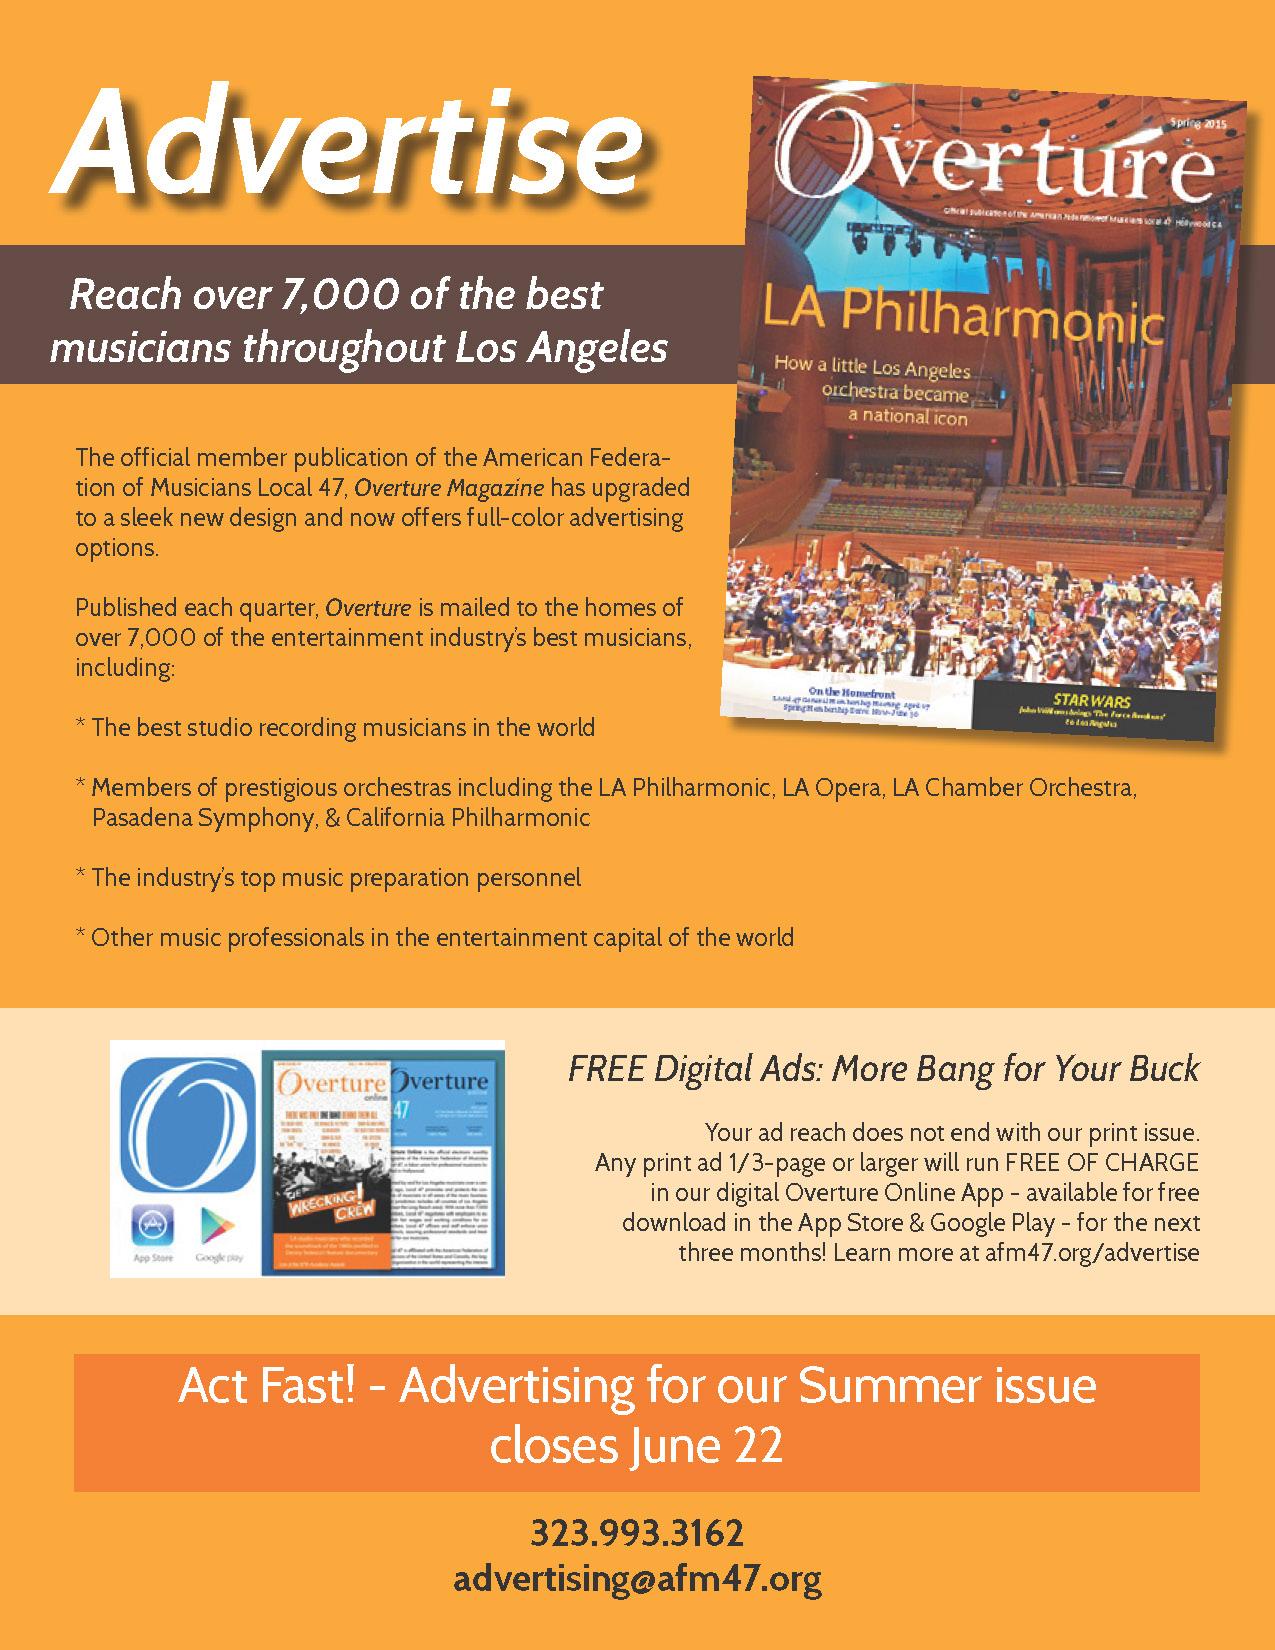 Overture Ad Summer 2015 flyer